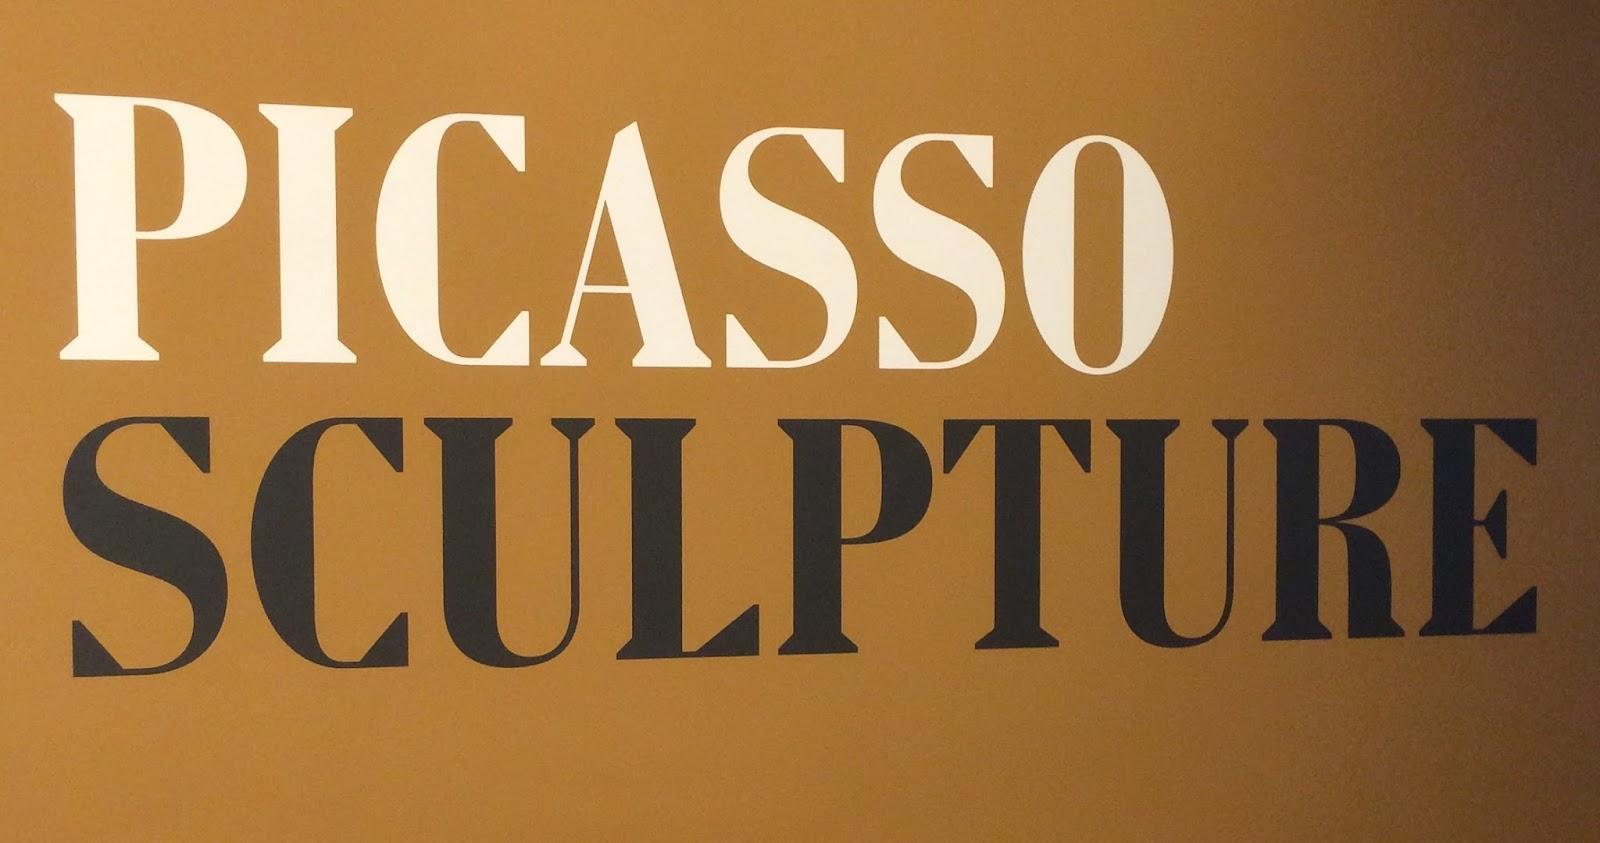 The 10 Year Plan: Piscasso Sculpture: \